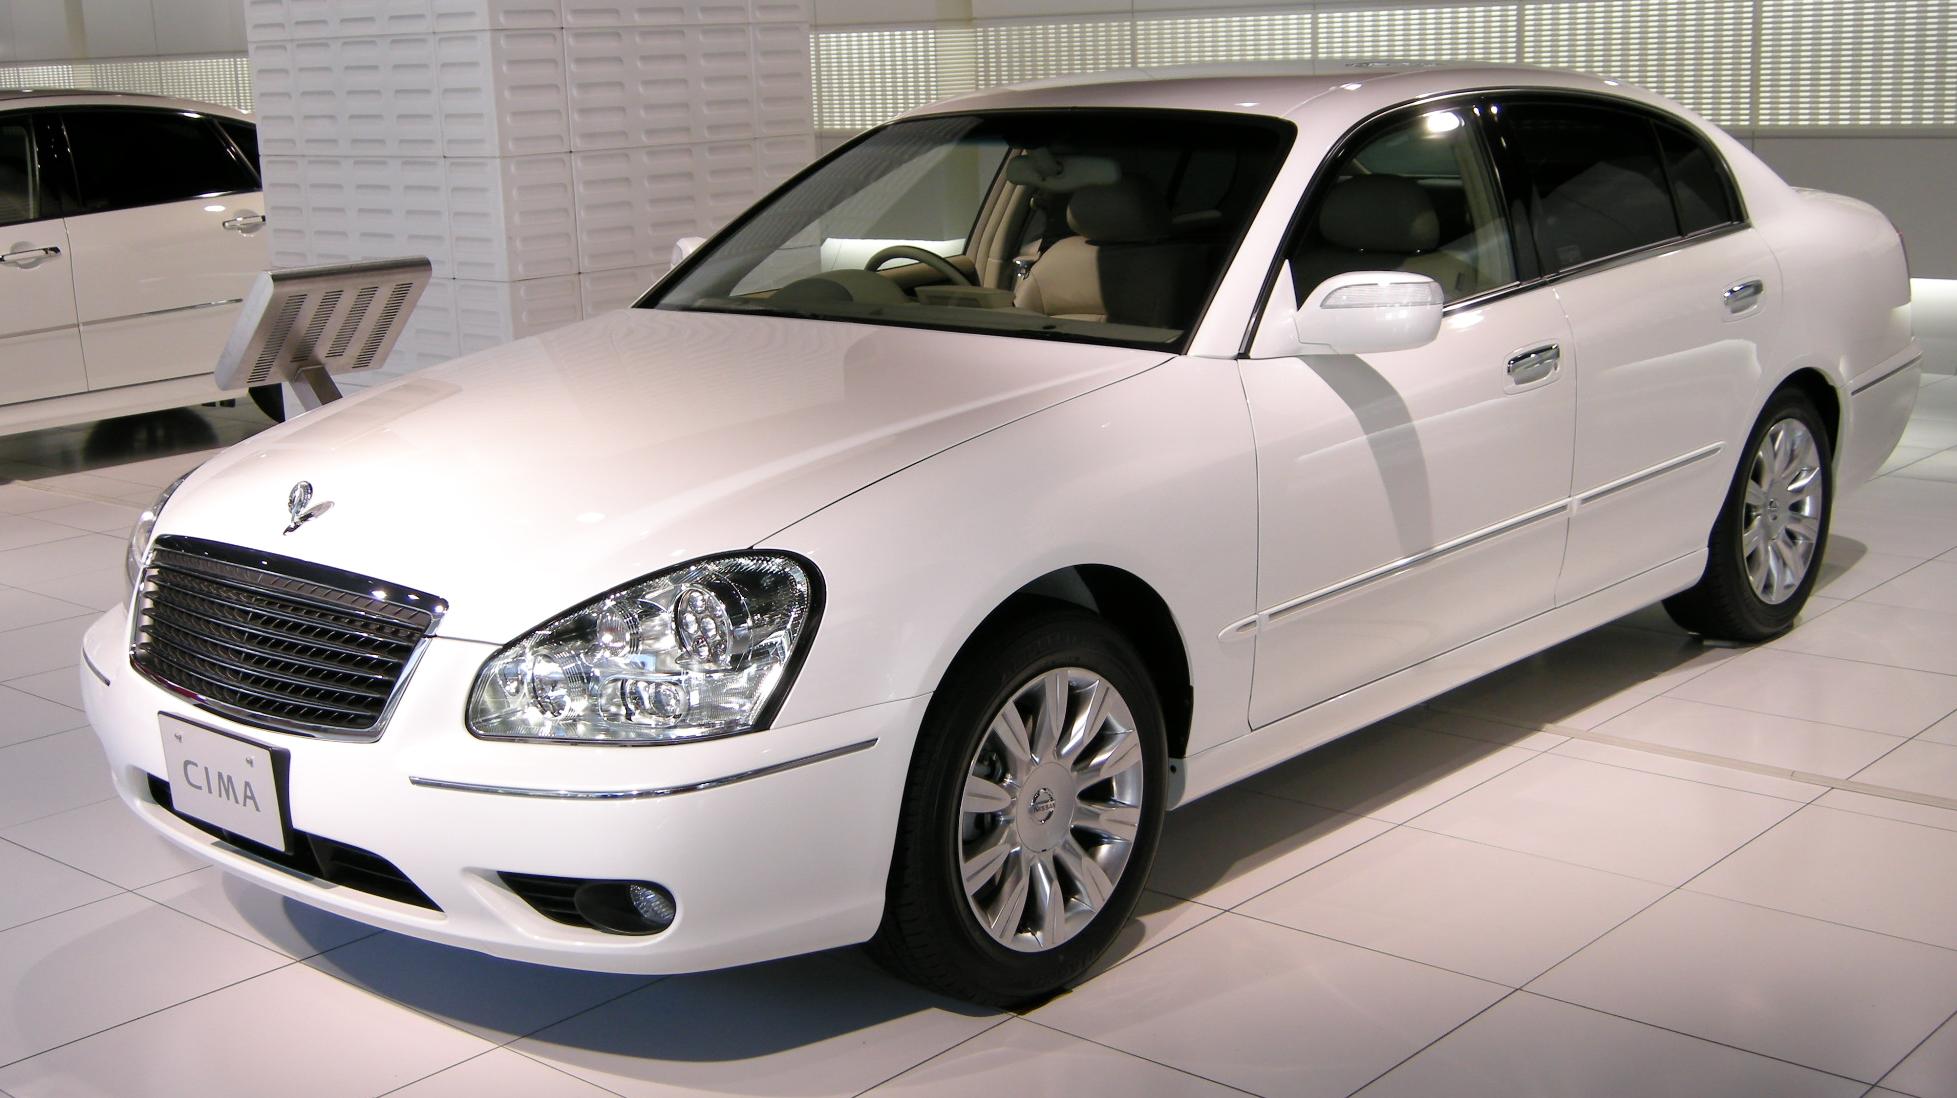 Nissan Cima (2002)